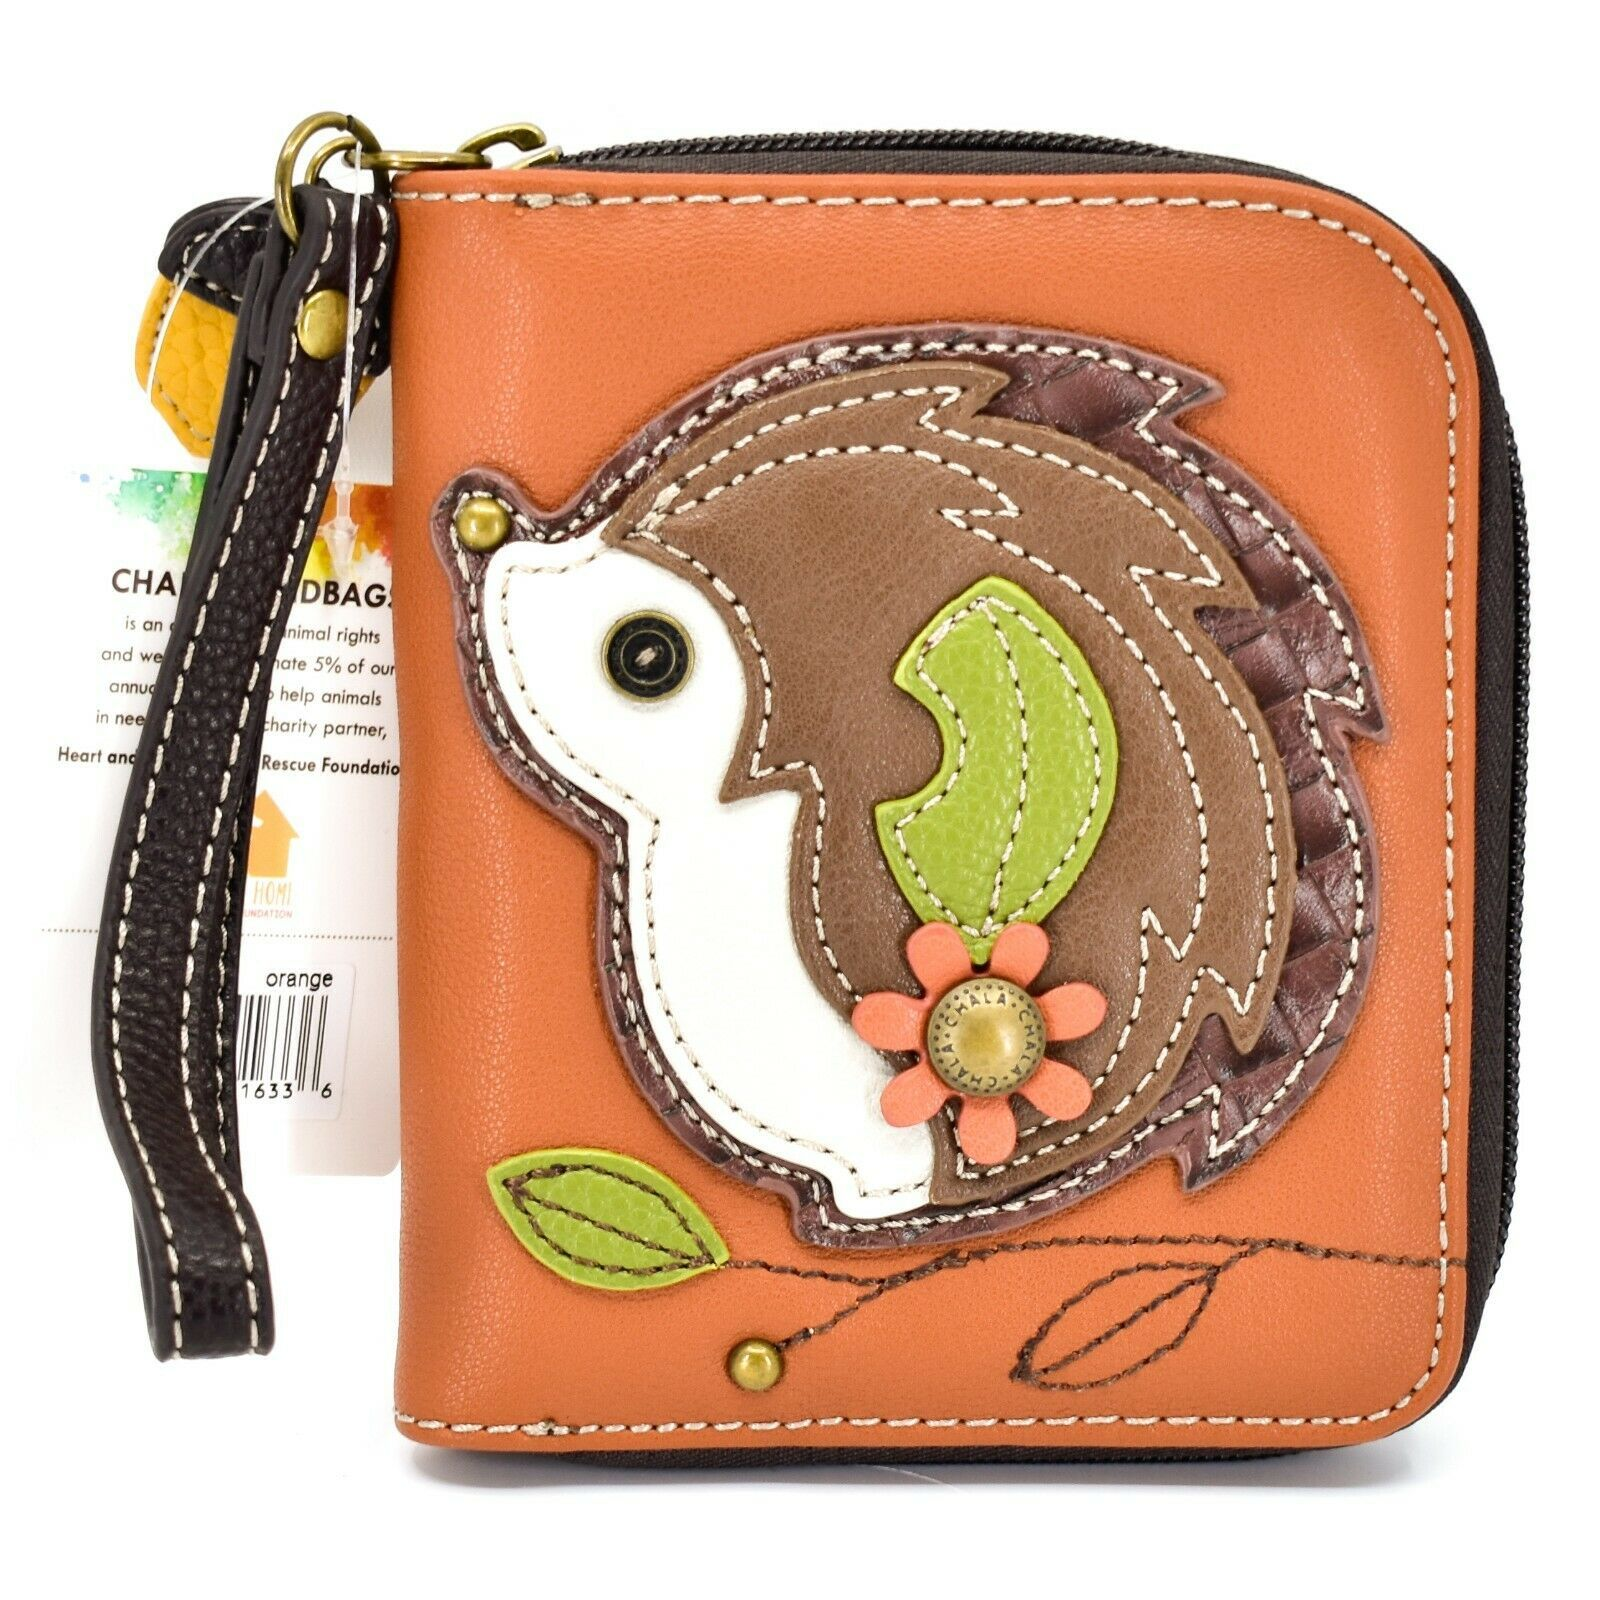 Chala Handbags Faux Leather Hedgehog Brown Zip Around Wristlet Wallet